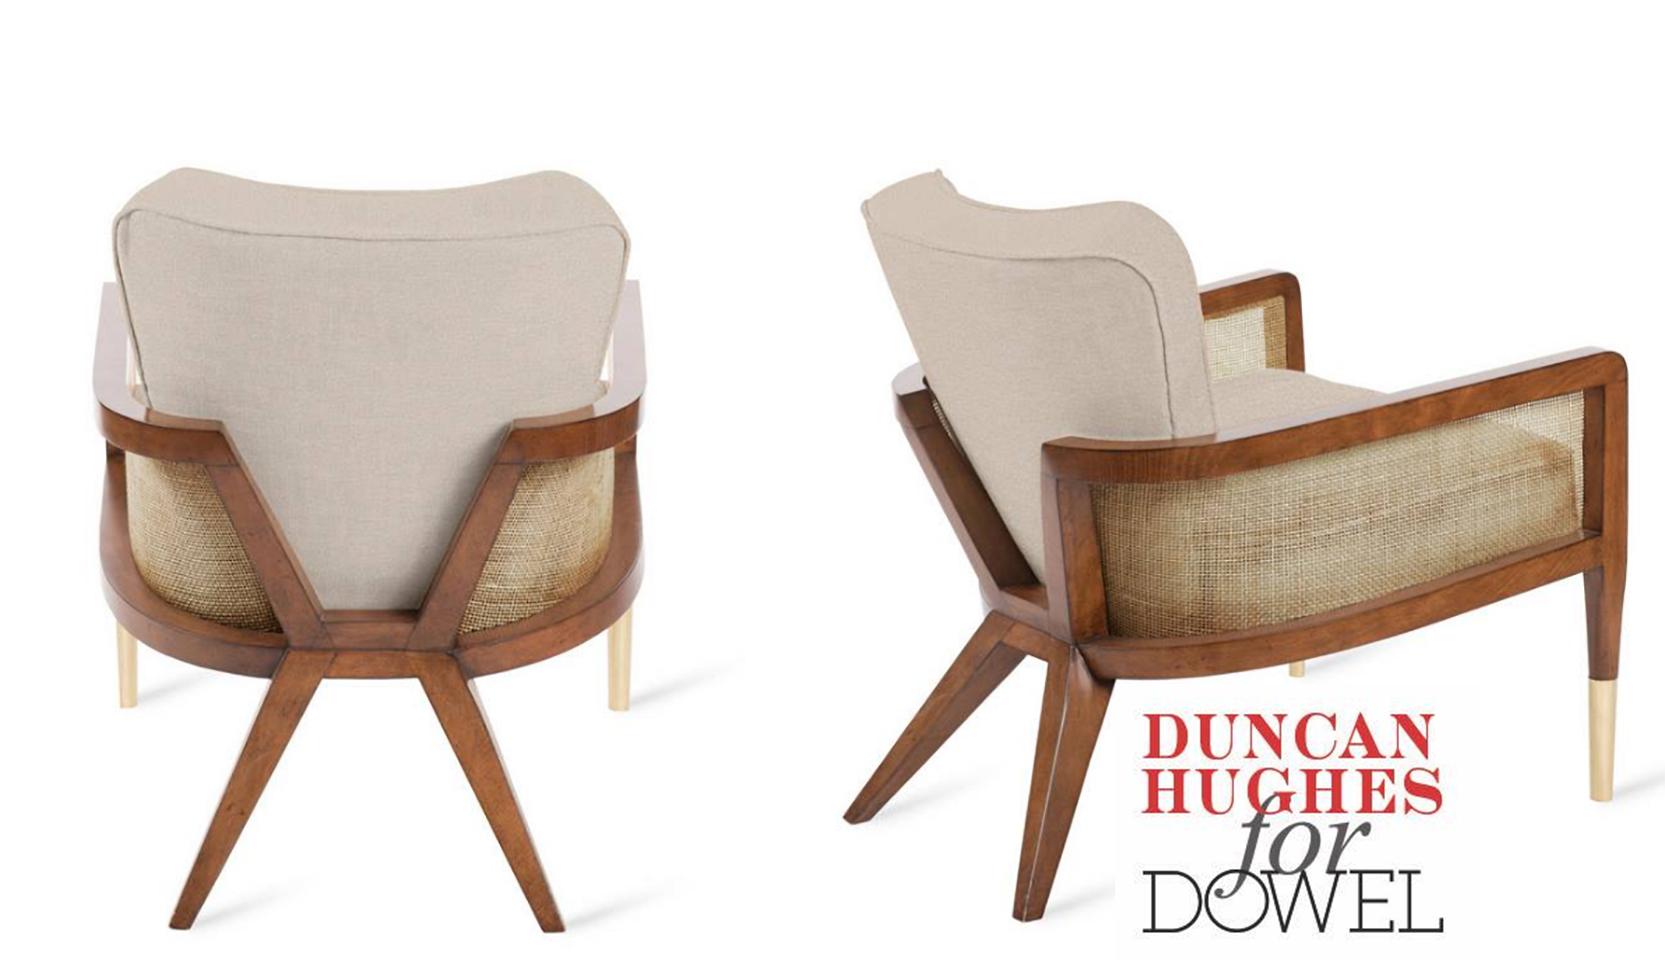 Furniture designed by interior designers